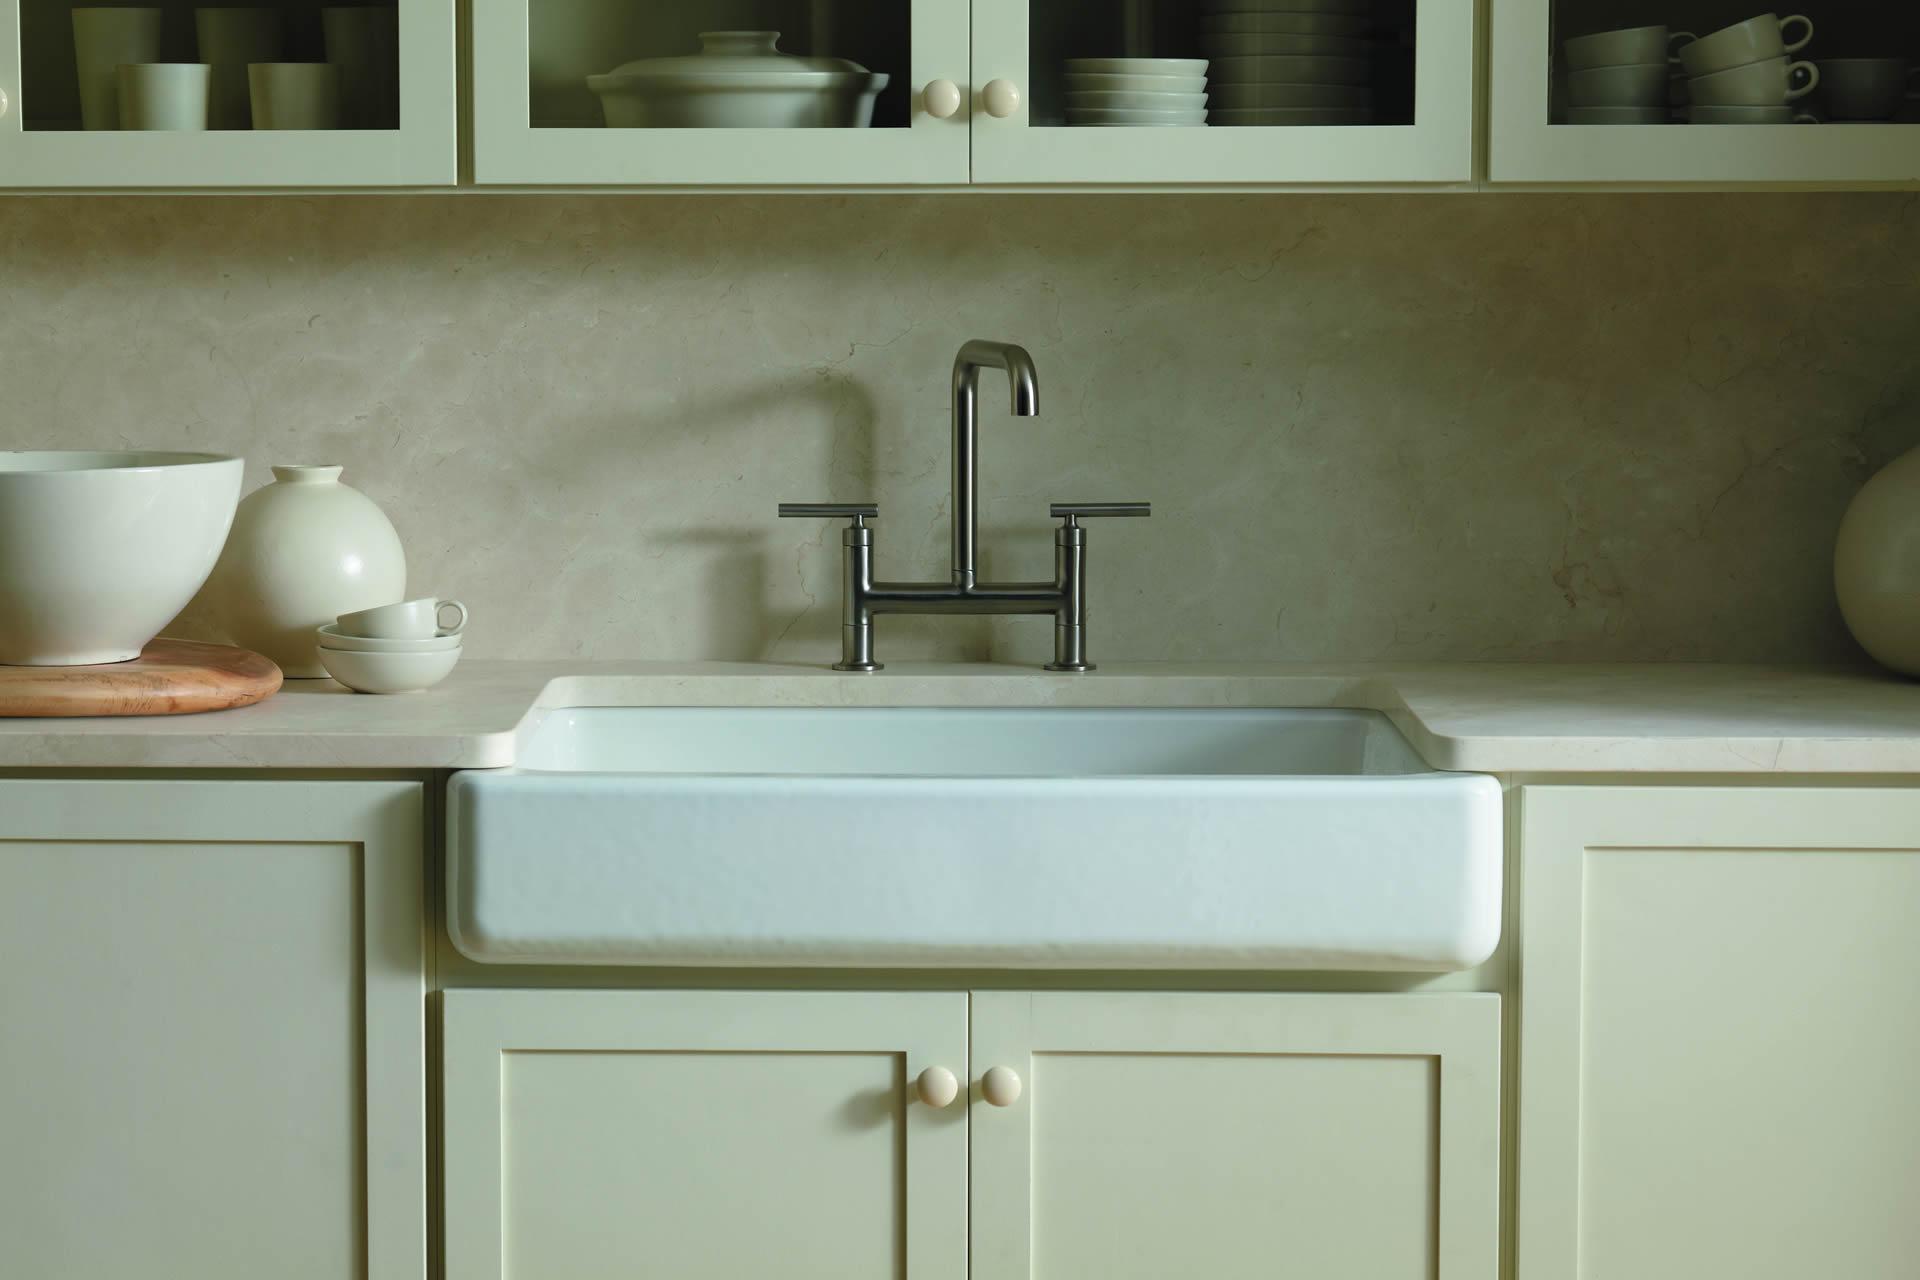 Kitchen Sinks Store Wool Kitchen And Bath Store